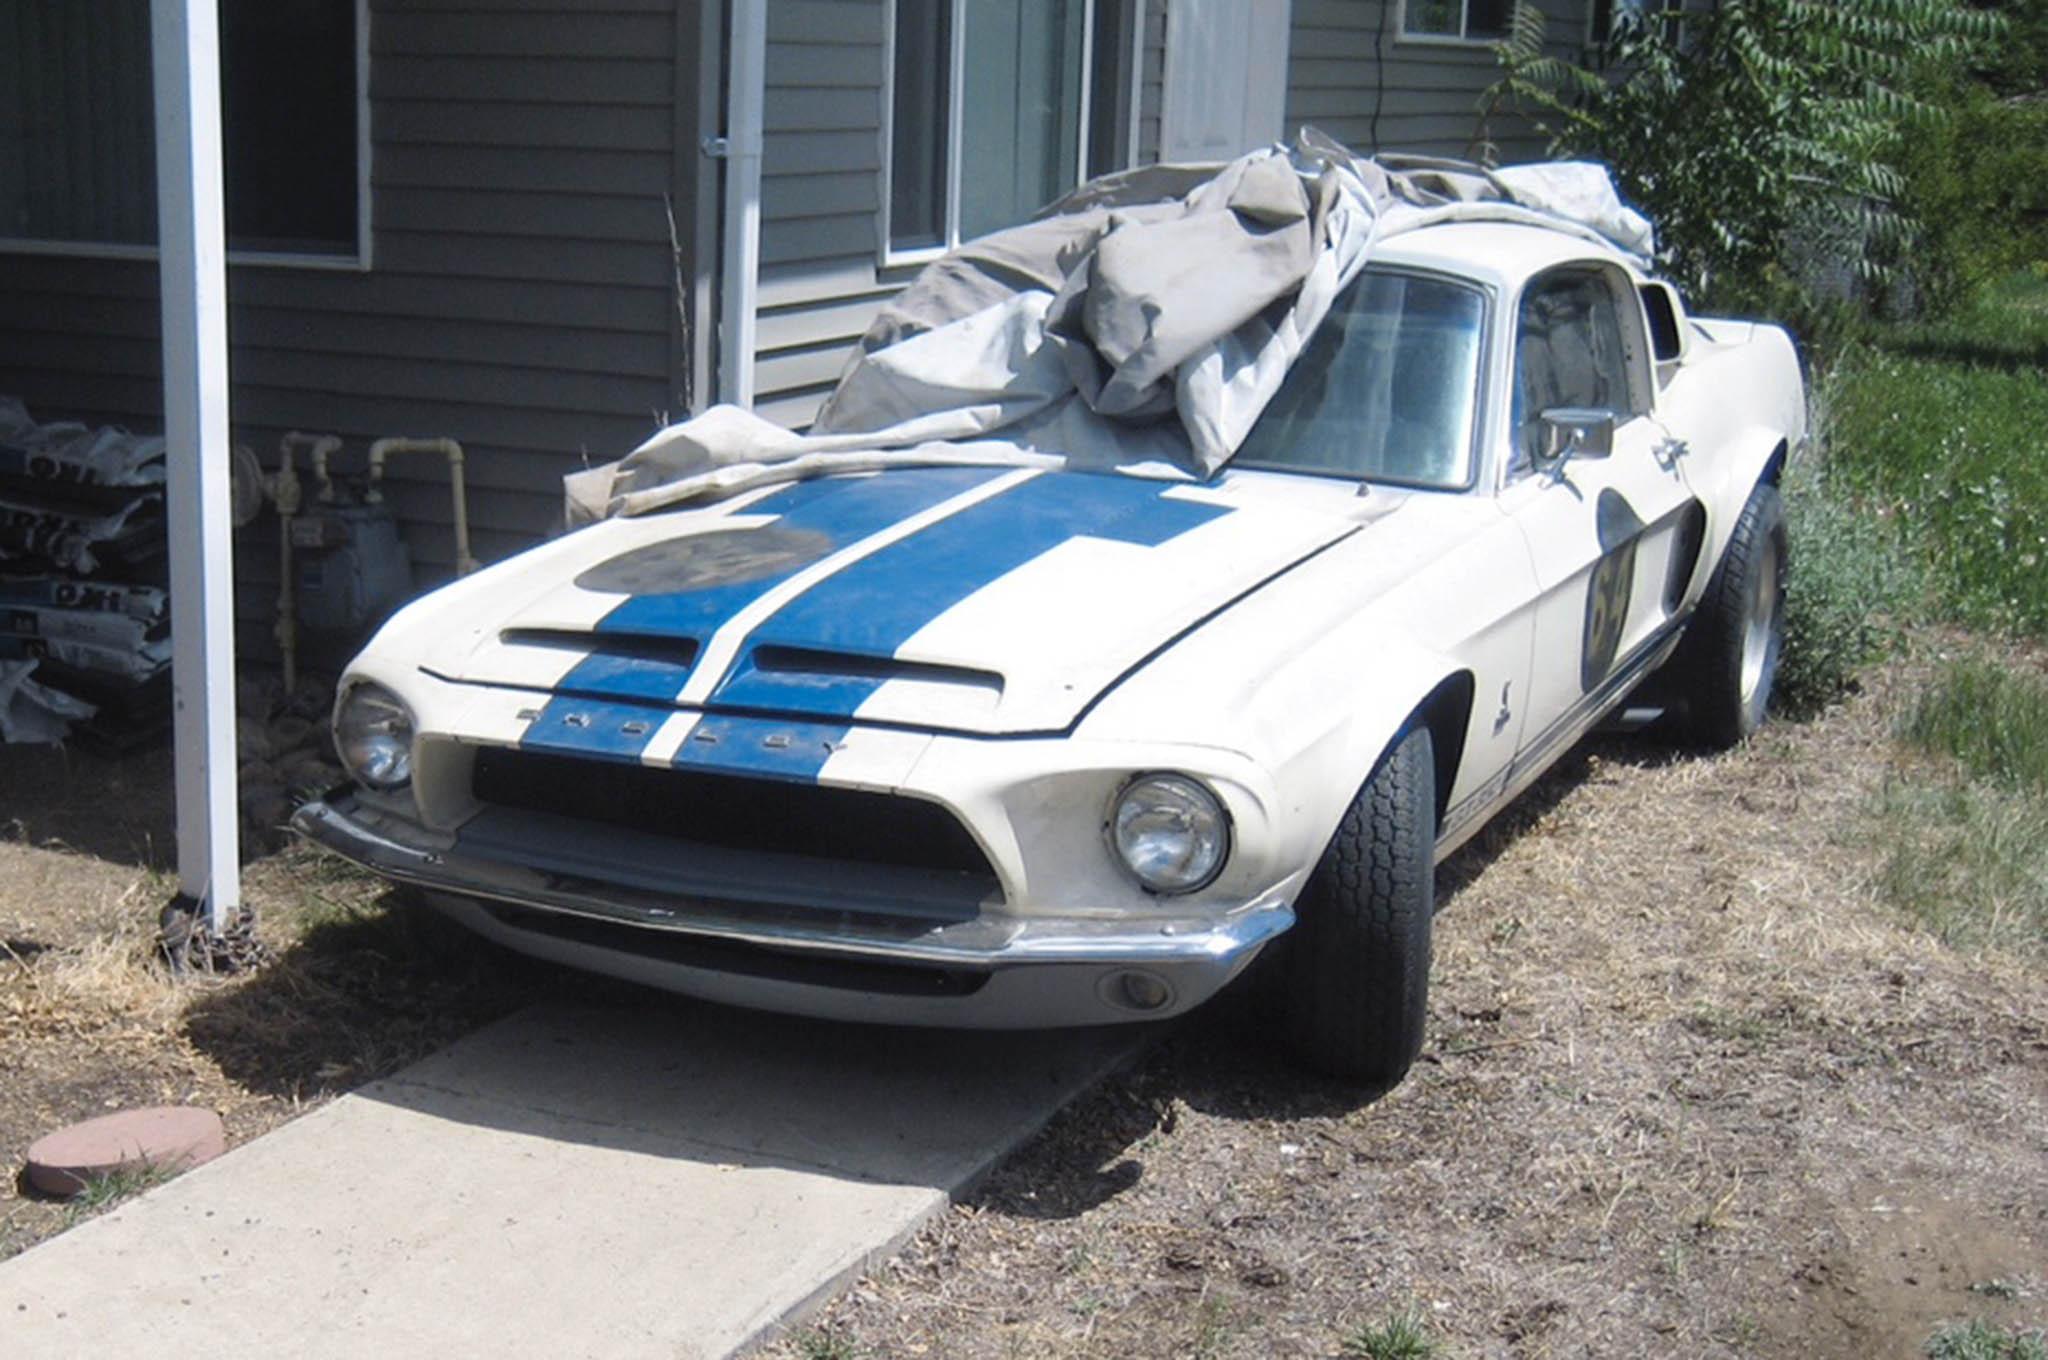 Barn Find: 1 Of 223 1968 Shelby GT350 Hertz Rental Cars